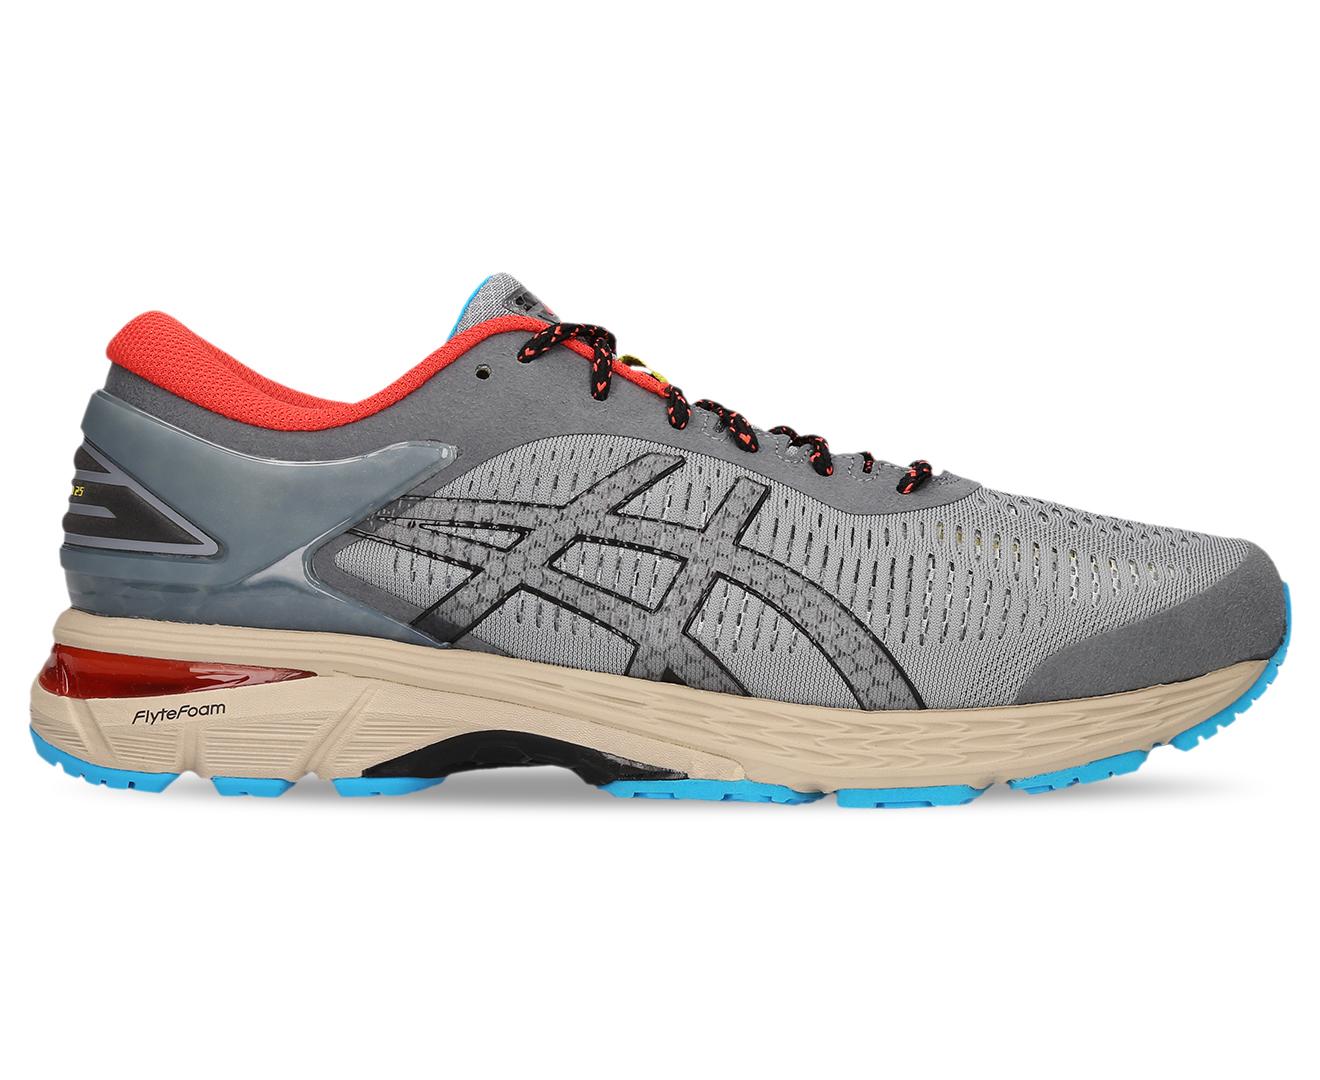 brand new 080e9 486d7 Details about ASICS Men's GEL-Kayano 25 Shoe - Stone Grey/Black